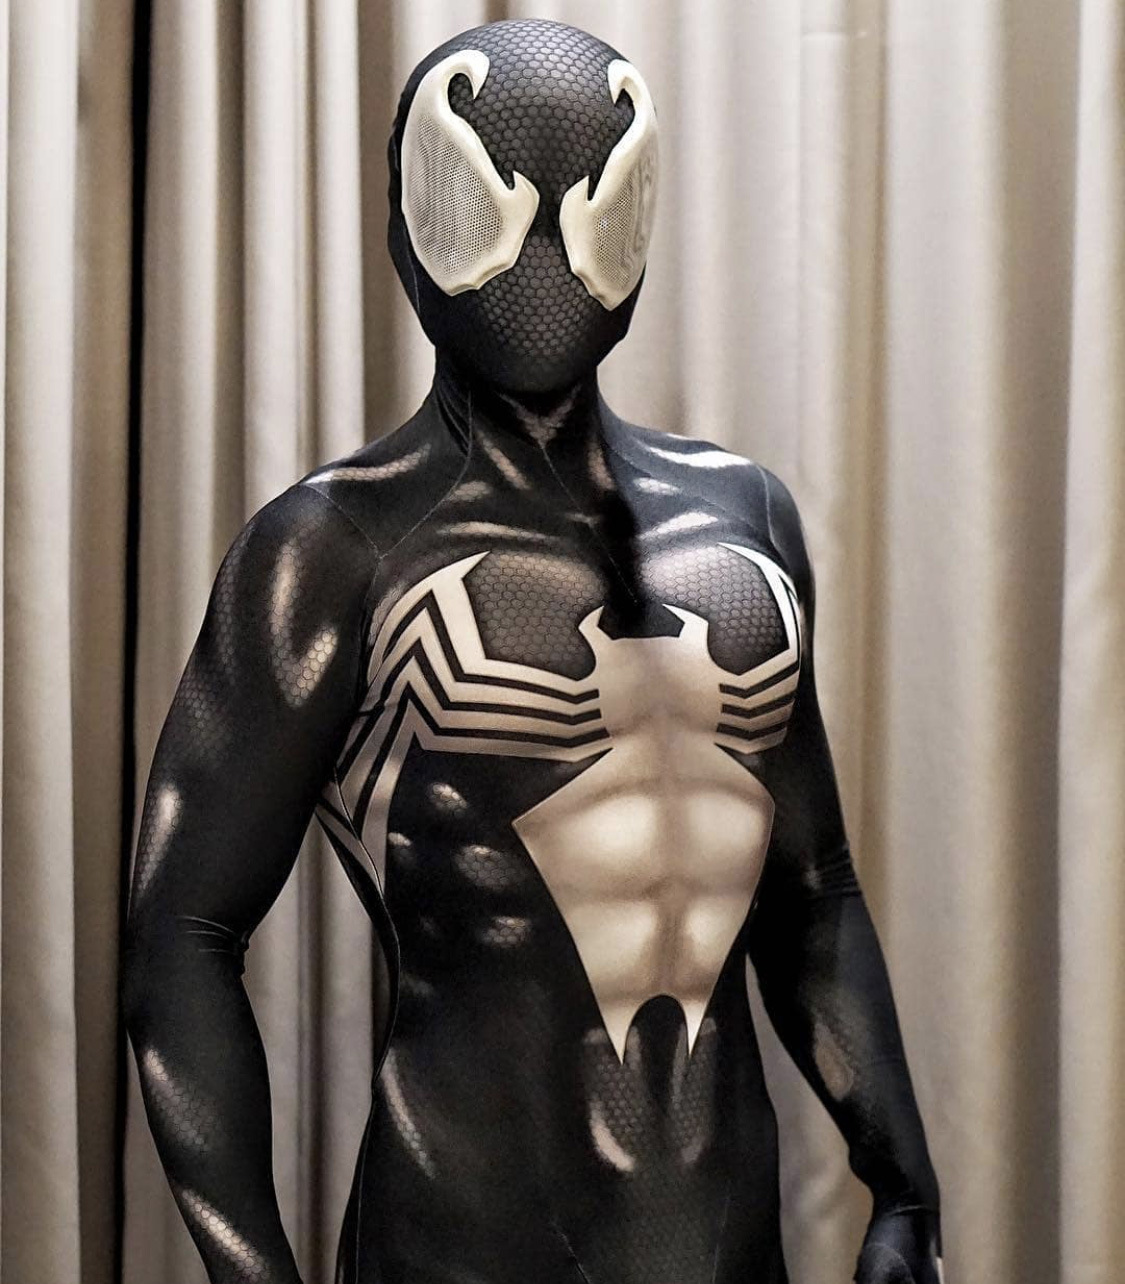 Anime Symbiote Lycra Spandex 3D Print Halloween Costume Cosplay Bodysuit Superhero Costume Zentai Swimming Suit